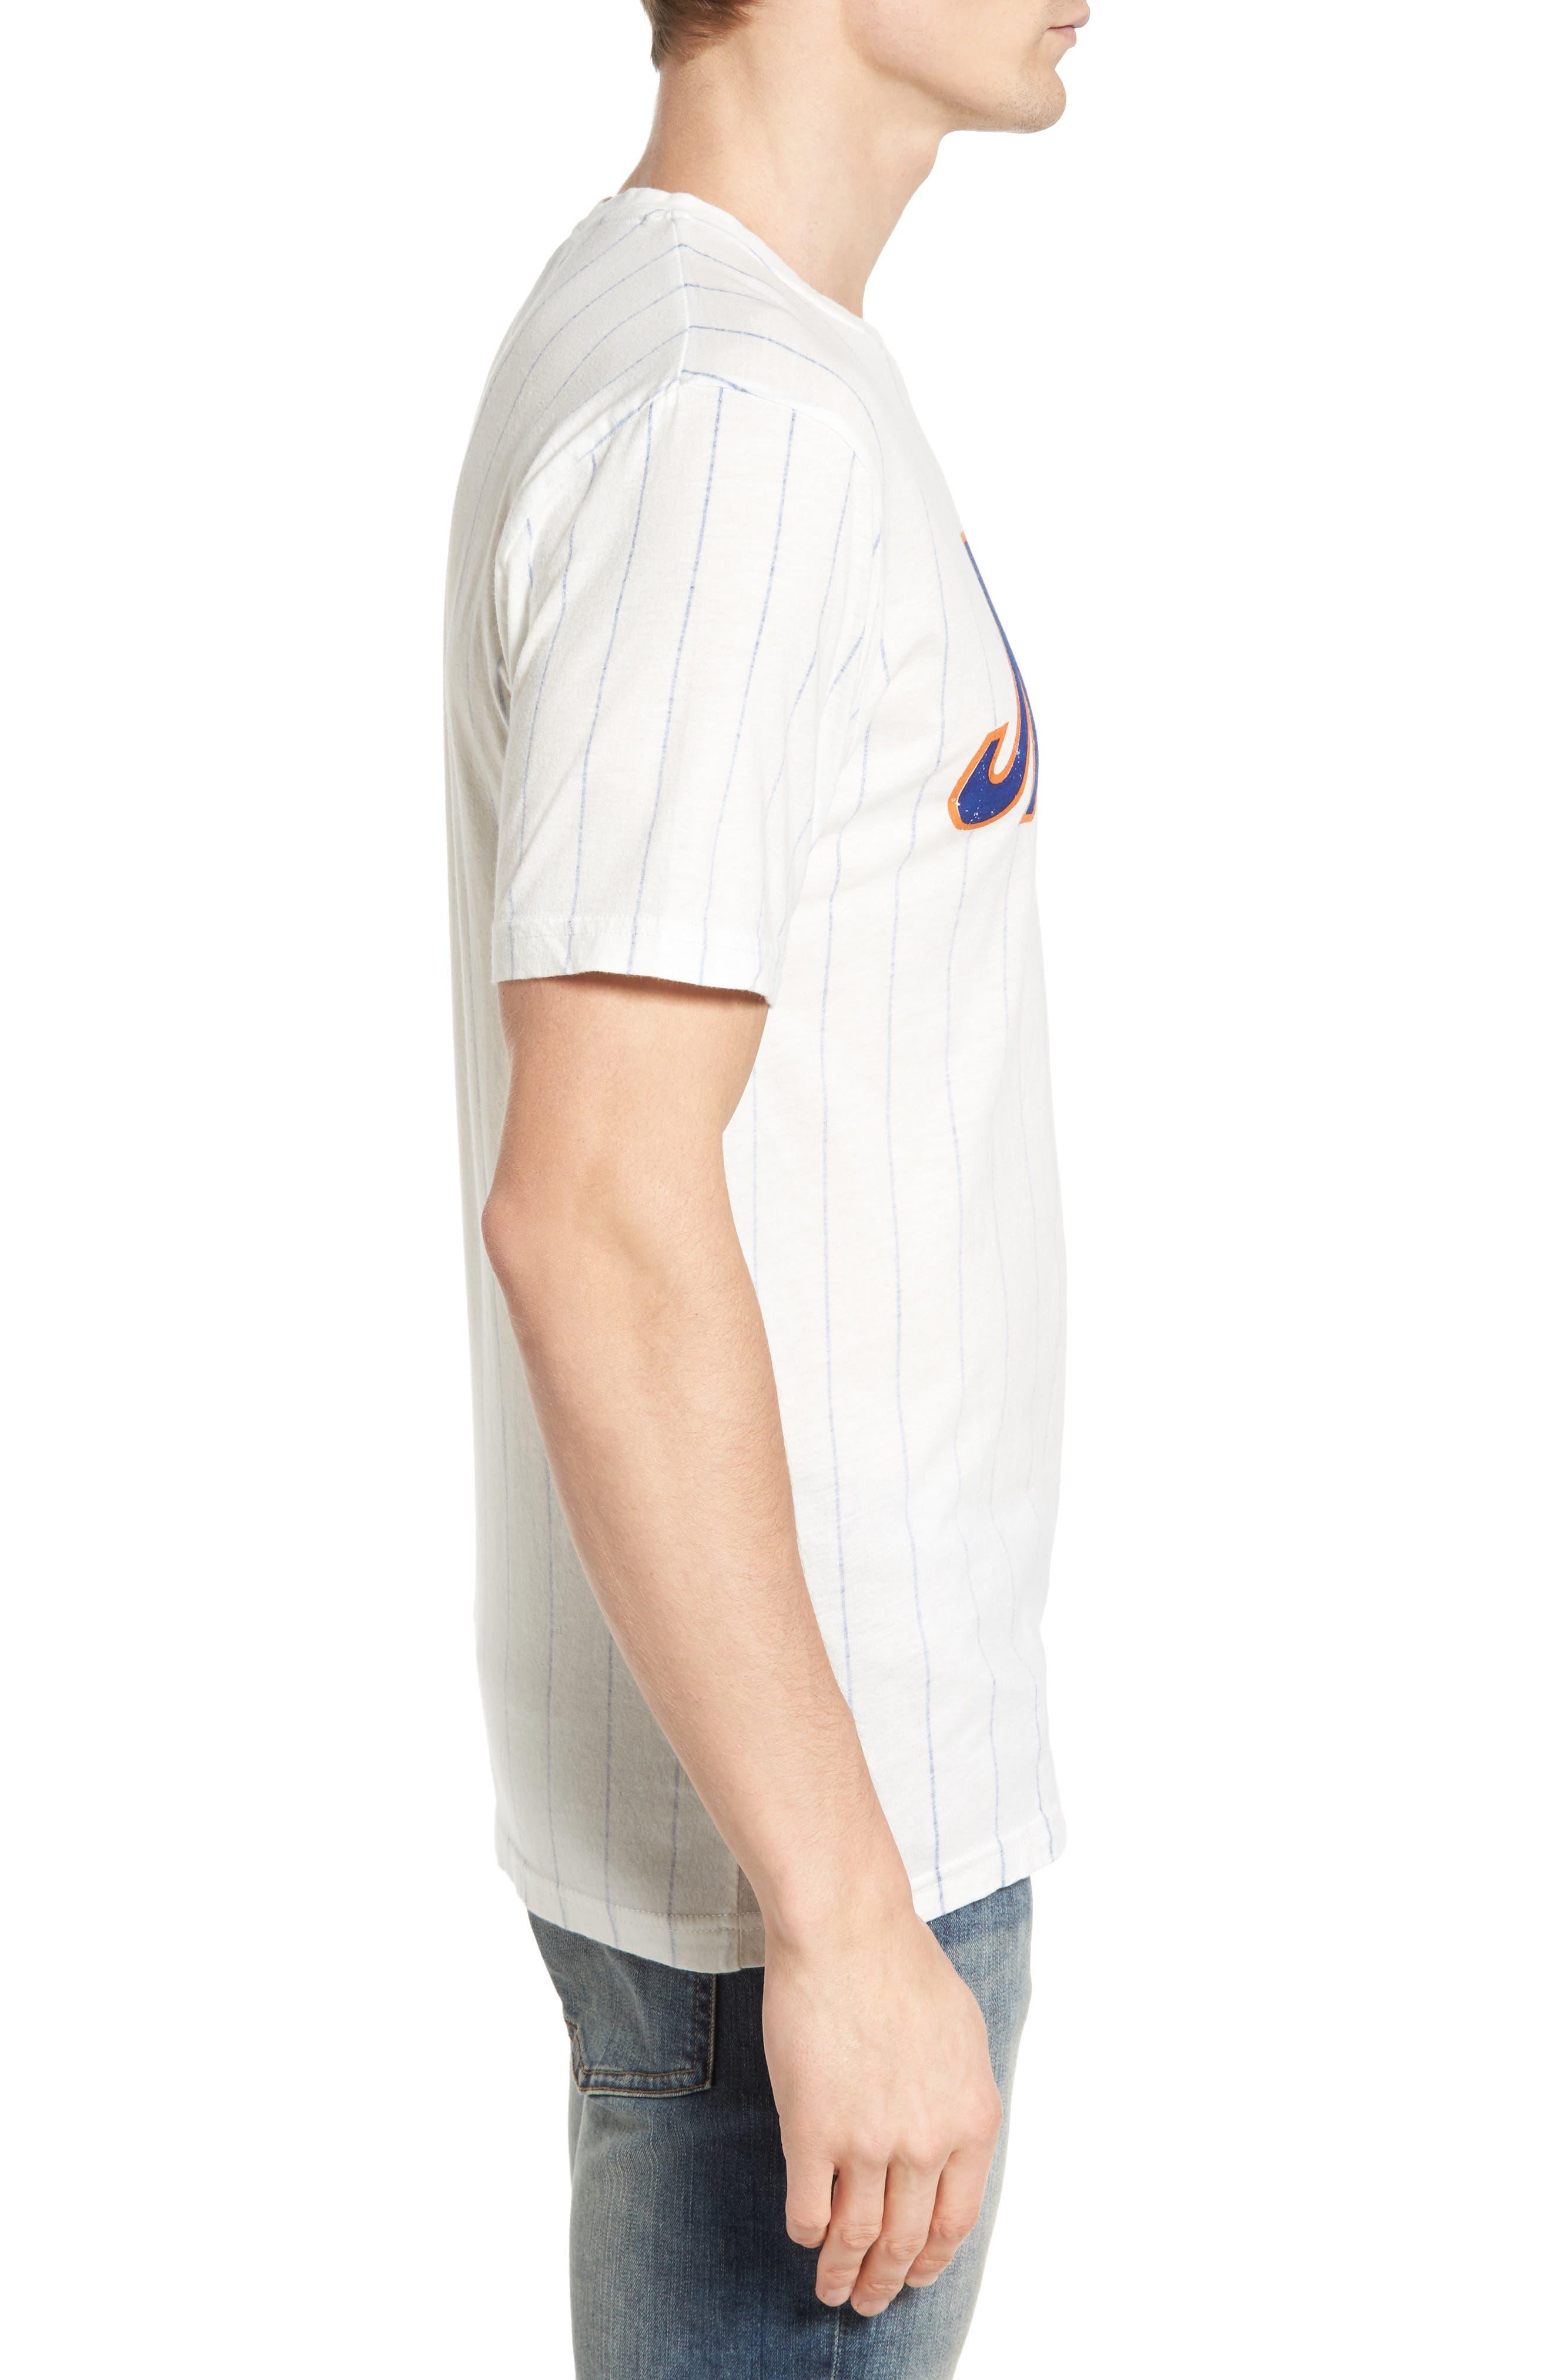 Brass Tack New York Mets T-Shirt,                             Alternate thumbnail 3, color,                             182